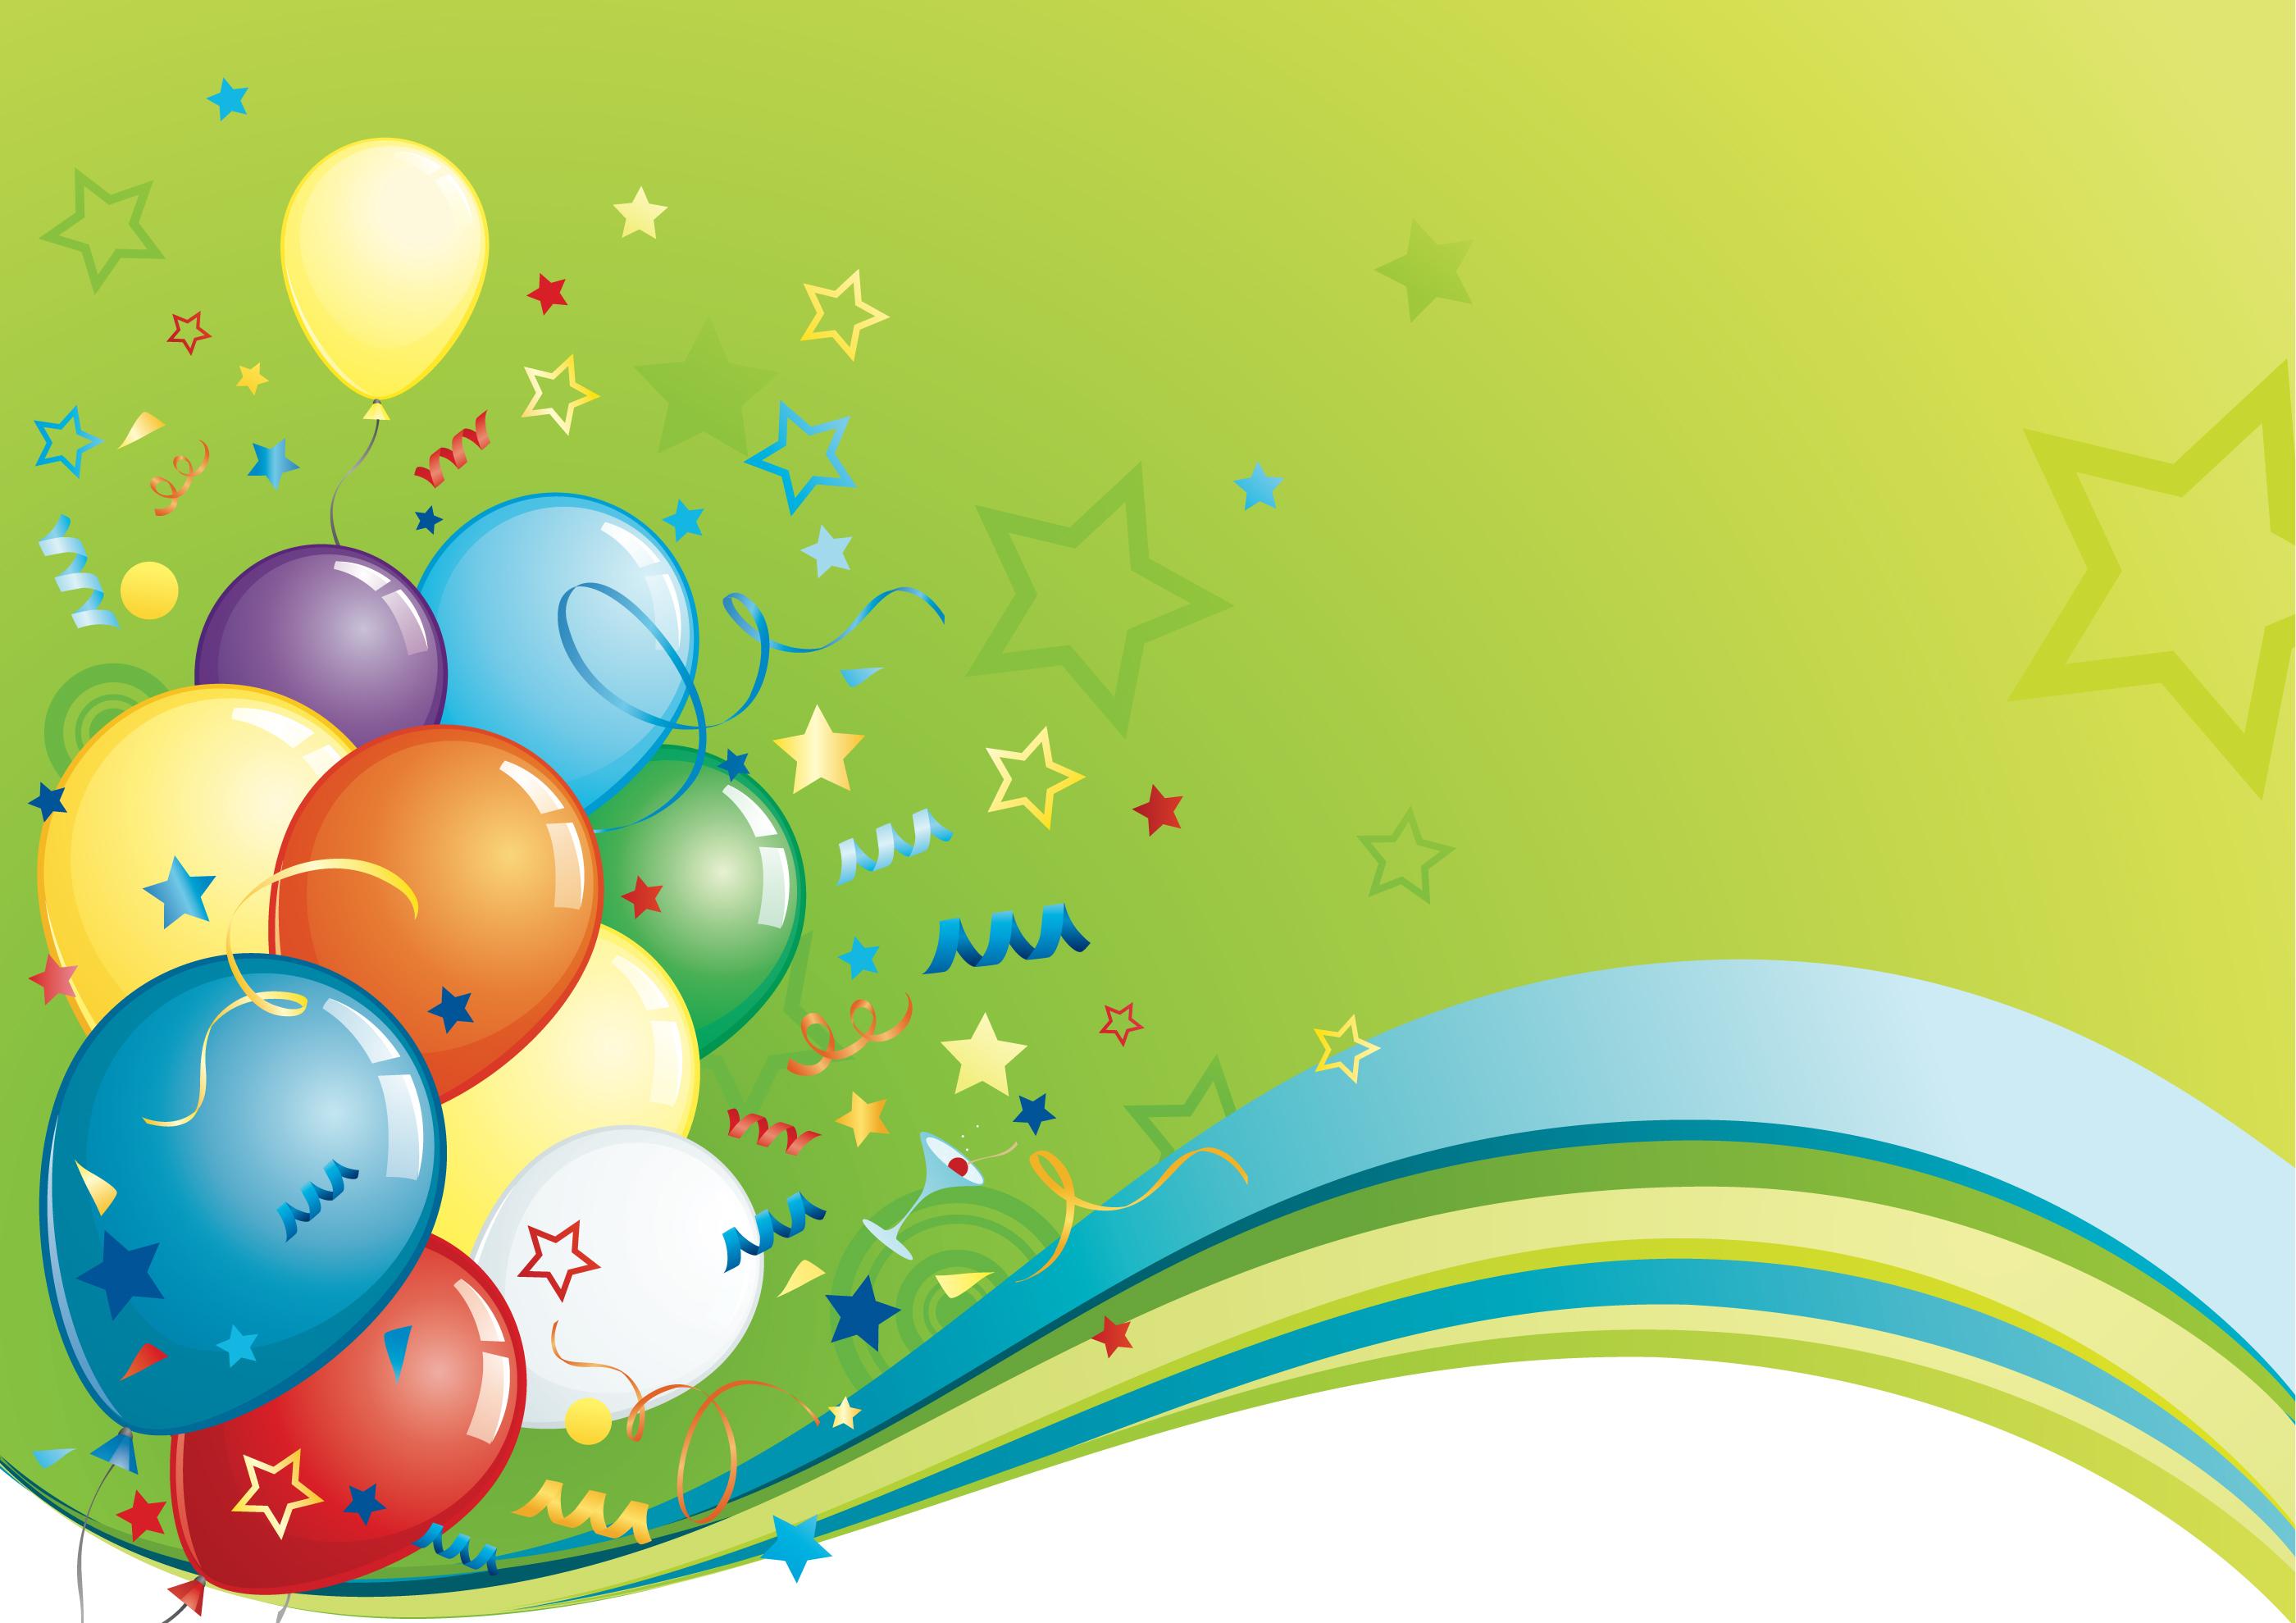 nNO4ml best birthday cake hd pic 4 on best birthday cake hd pic